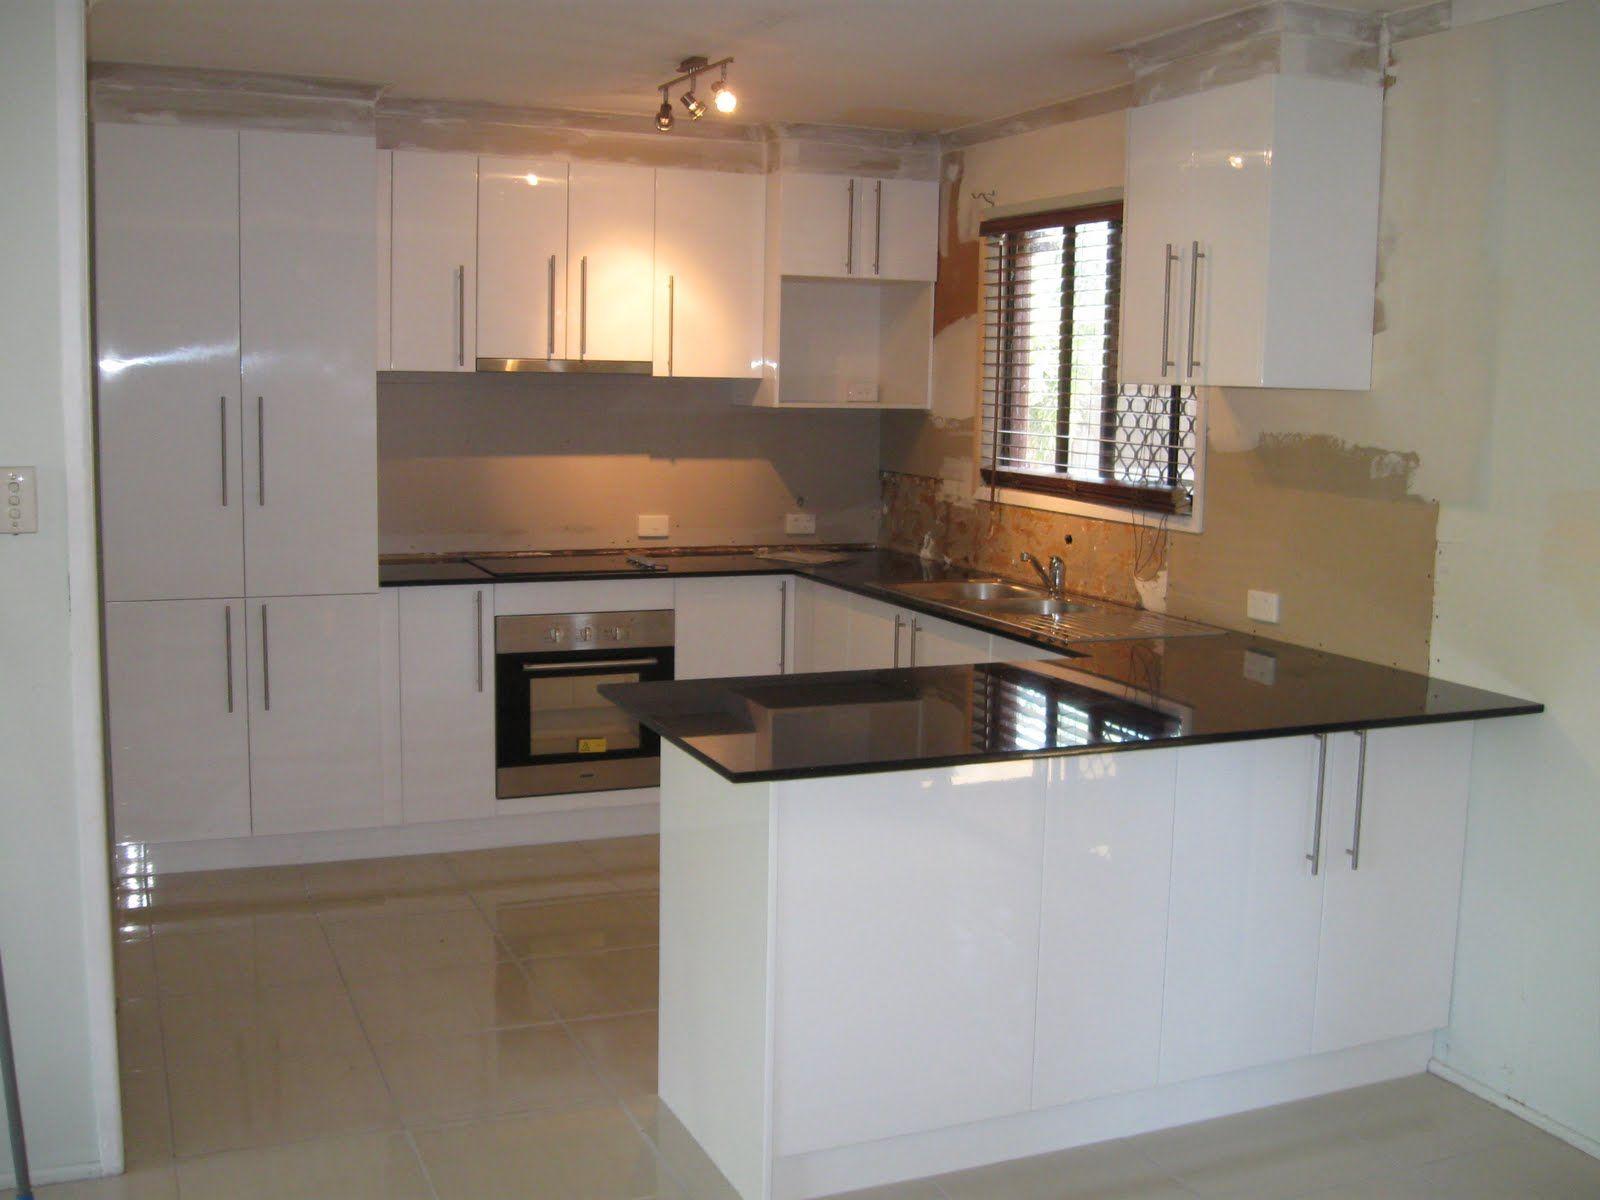 Add Value Kitchens: U SHAPE KITCHEN FROM ADD VALUE